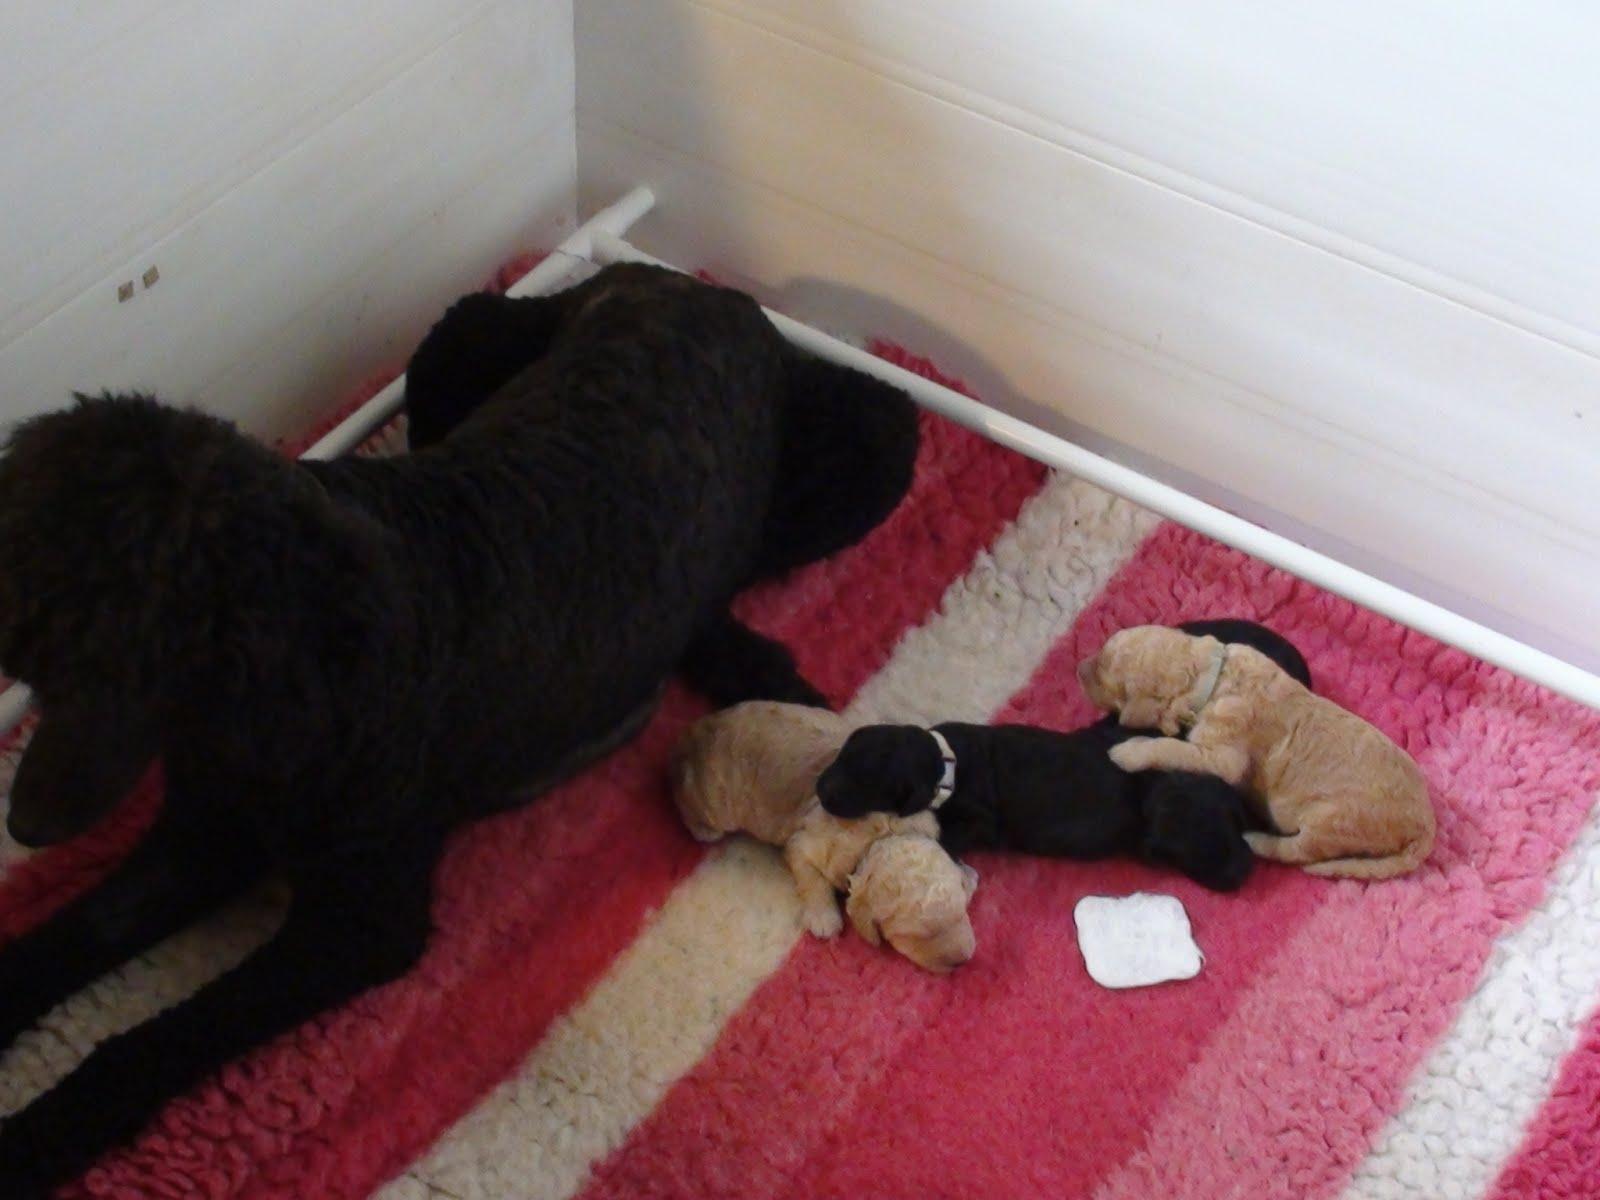 Brock-o-Dale Rare Breeds and Wywylwynd Standard Poodles: Home